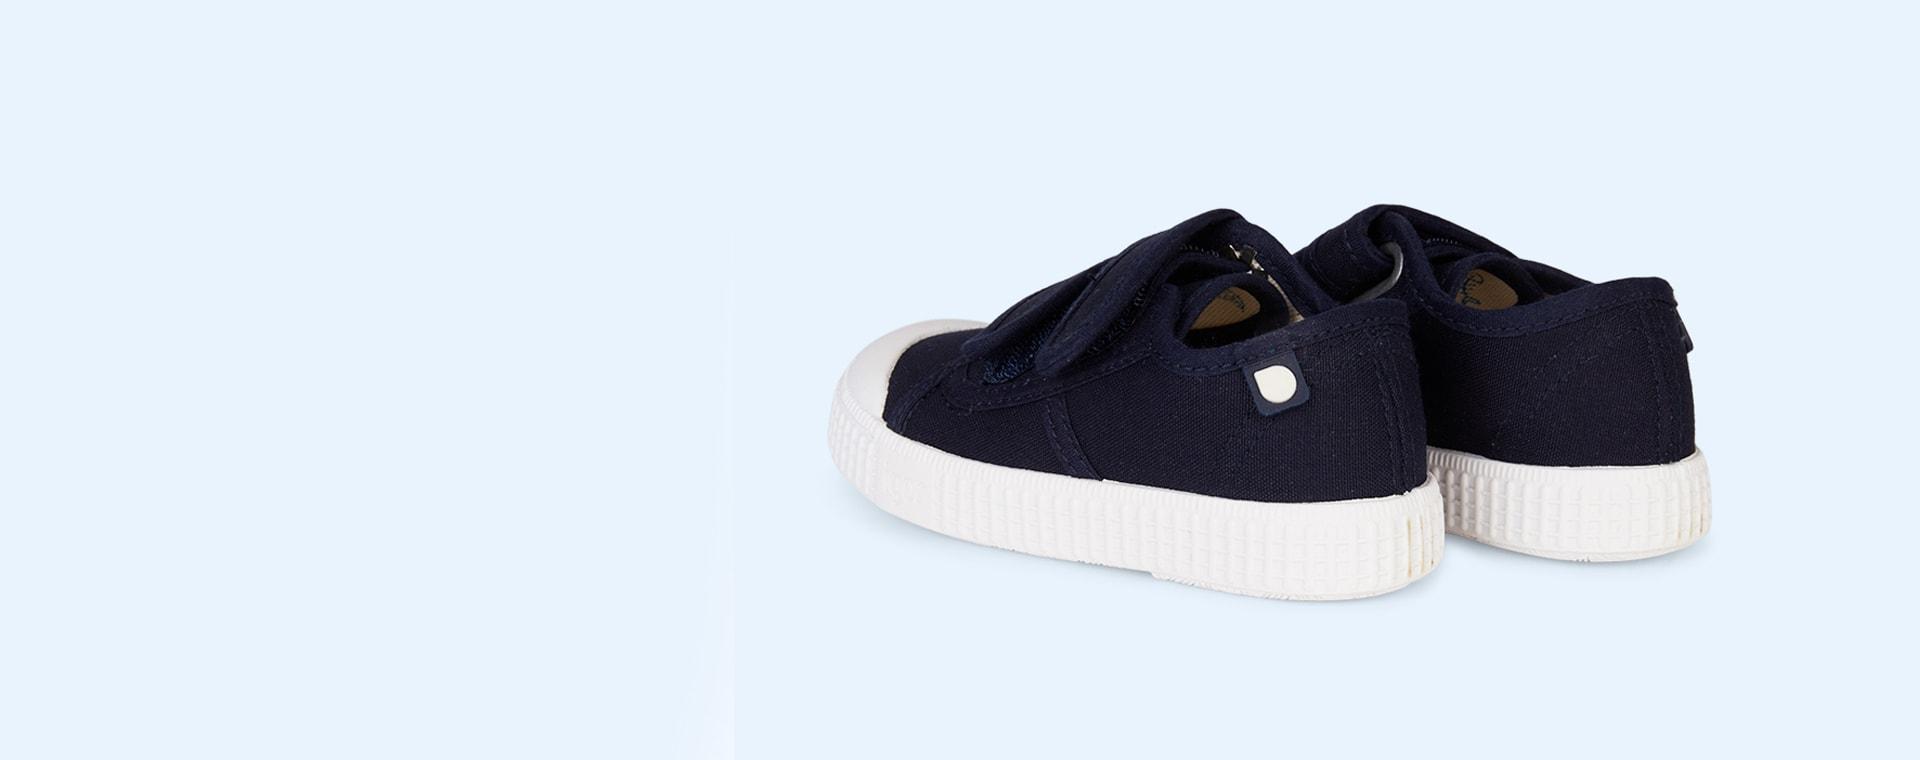 Marino igor Berri Velcro Tennis Shoe